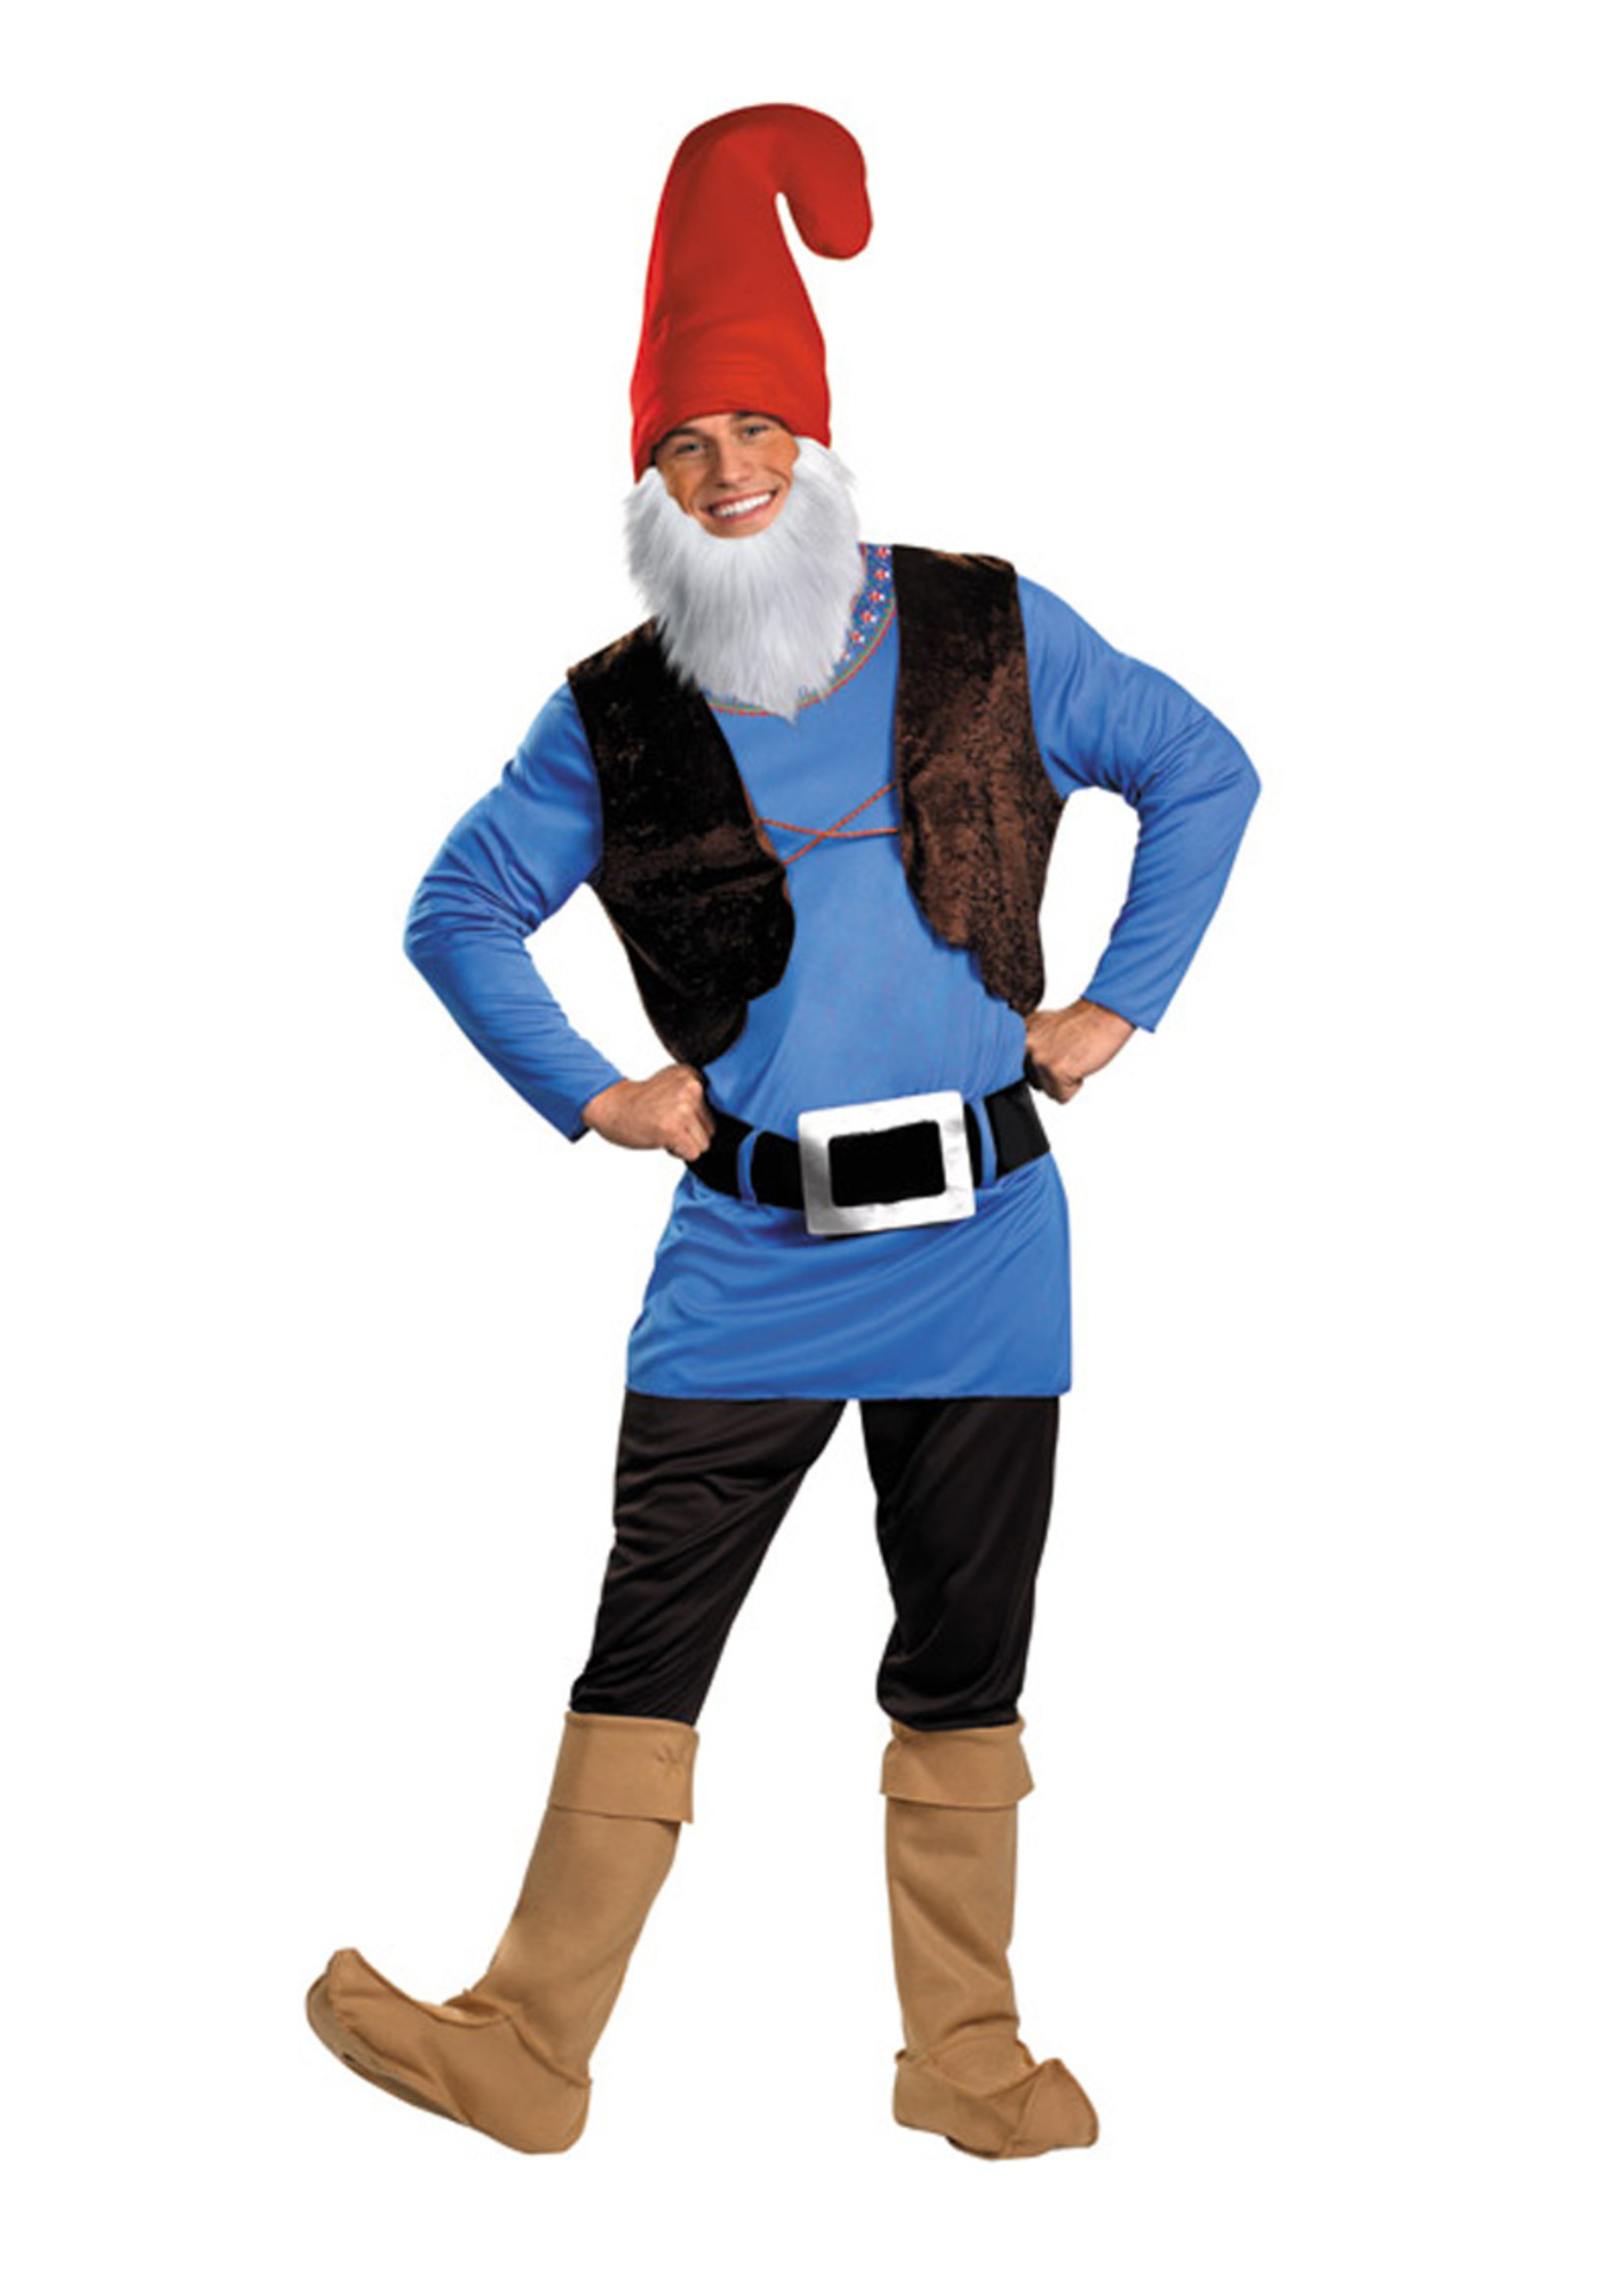 Papa Gnome Costume - Men's